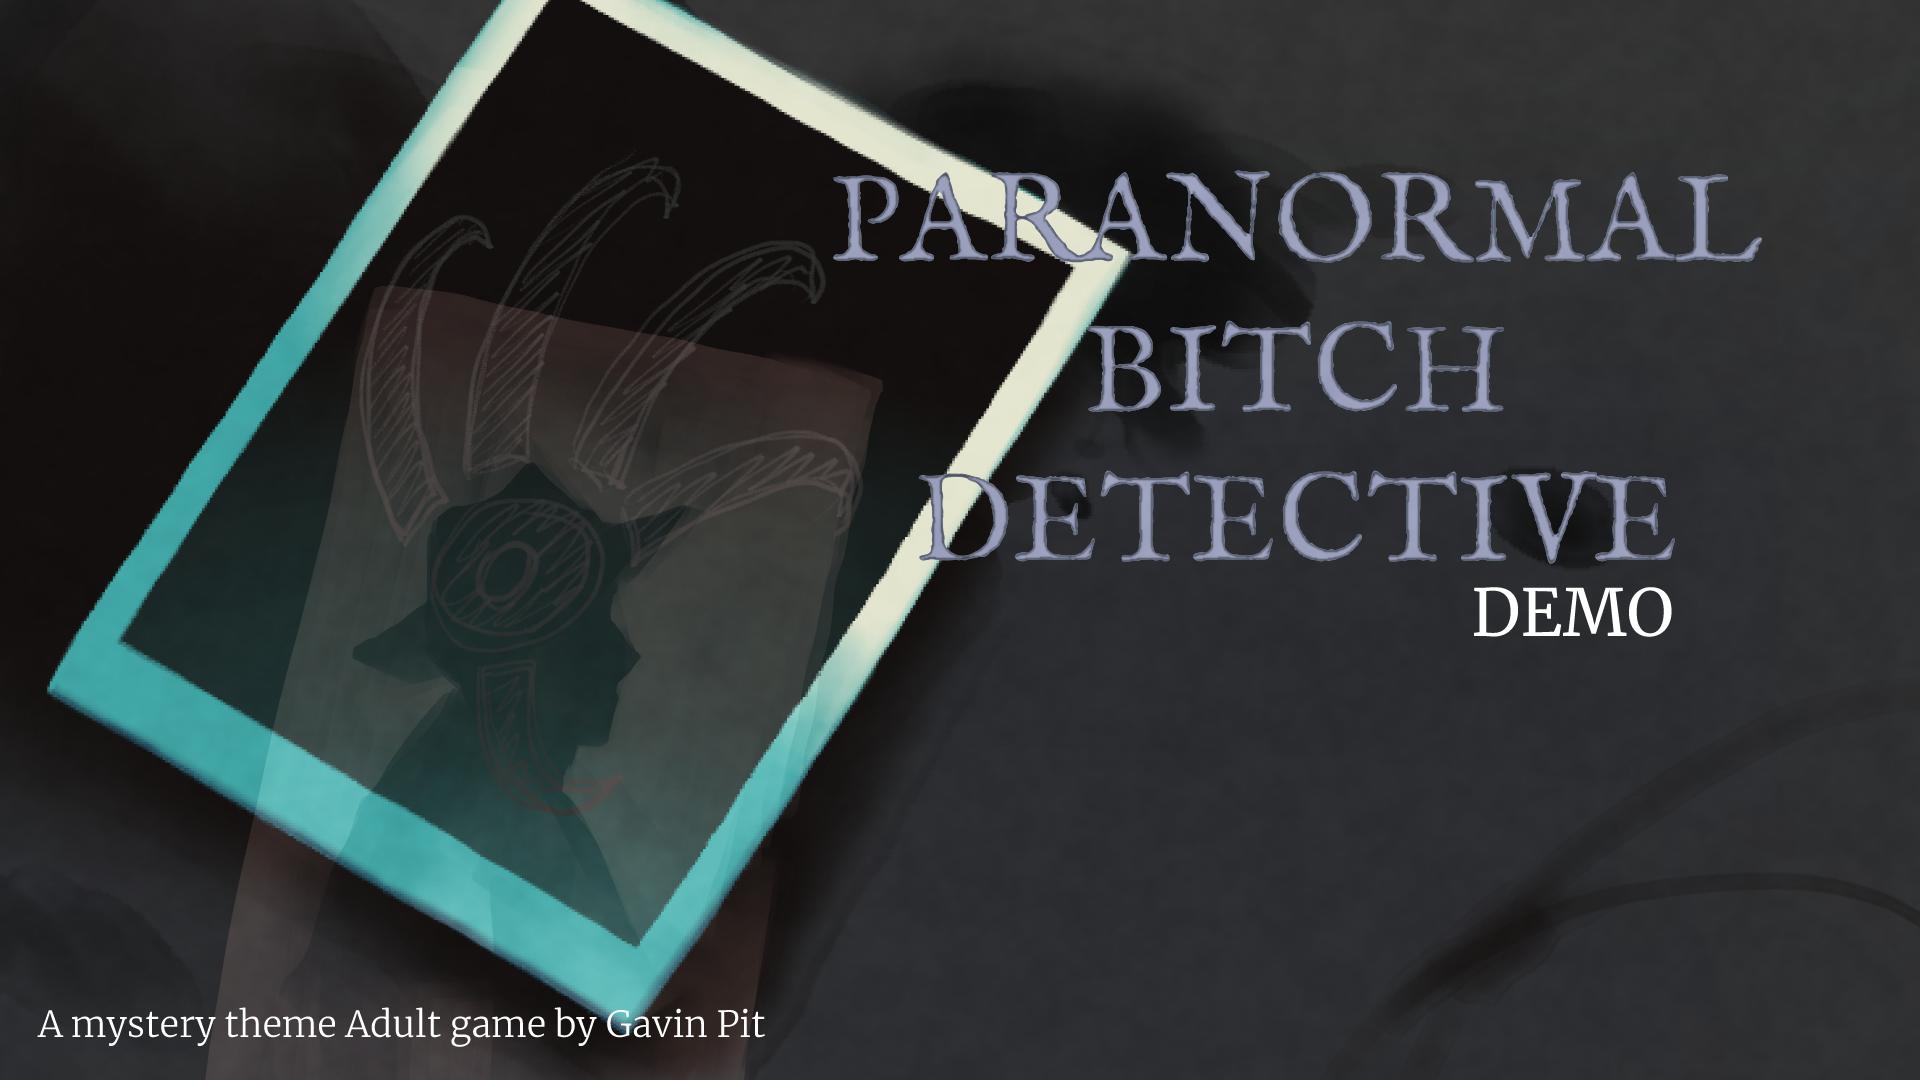 Paranormal Bitch Detective[DEMO]